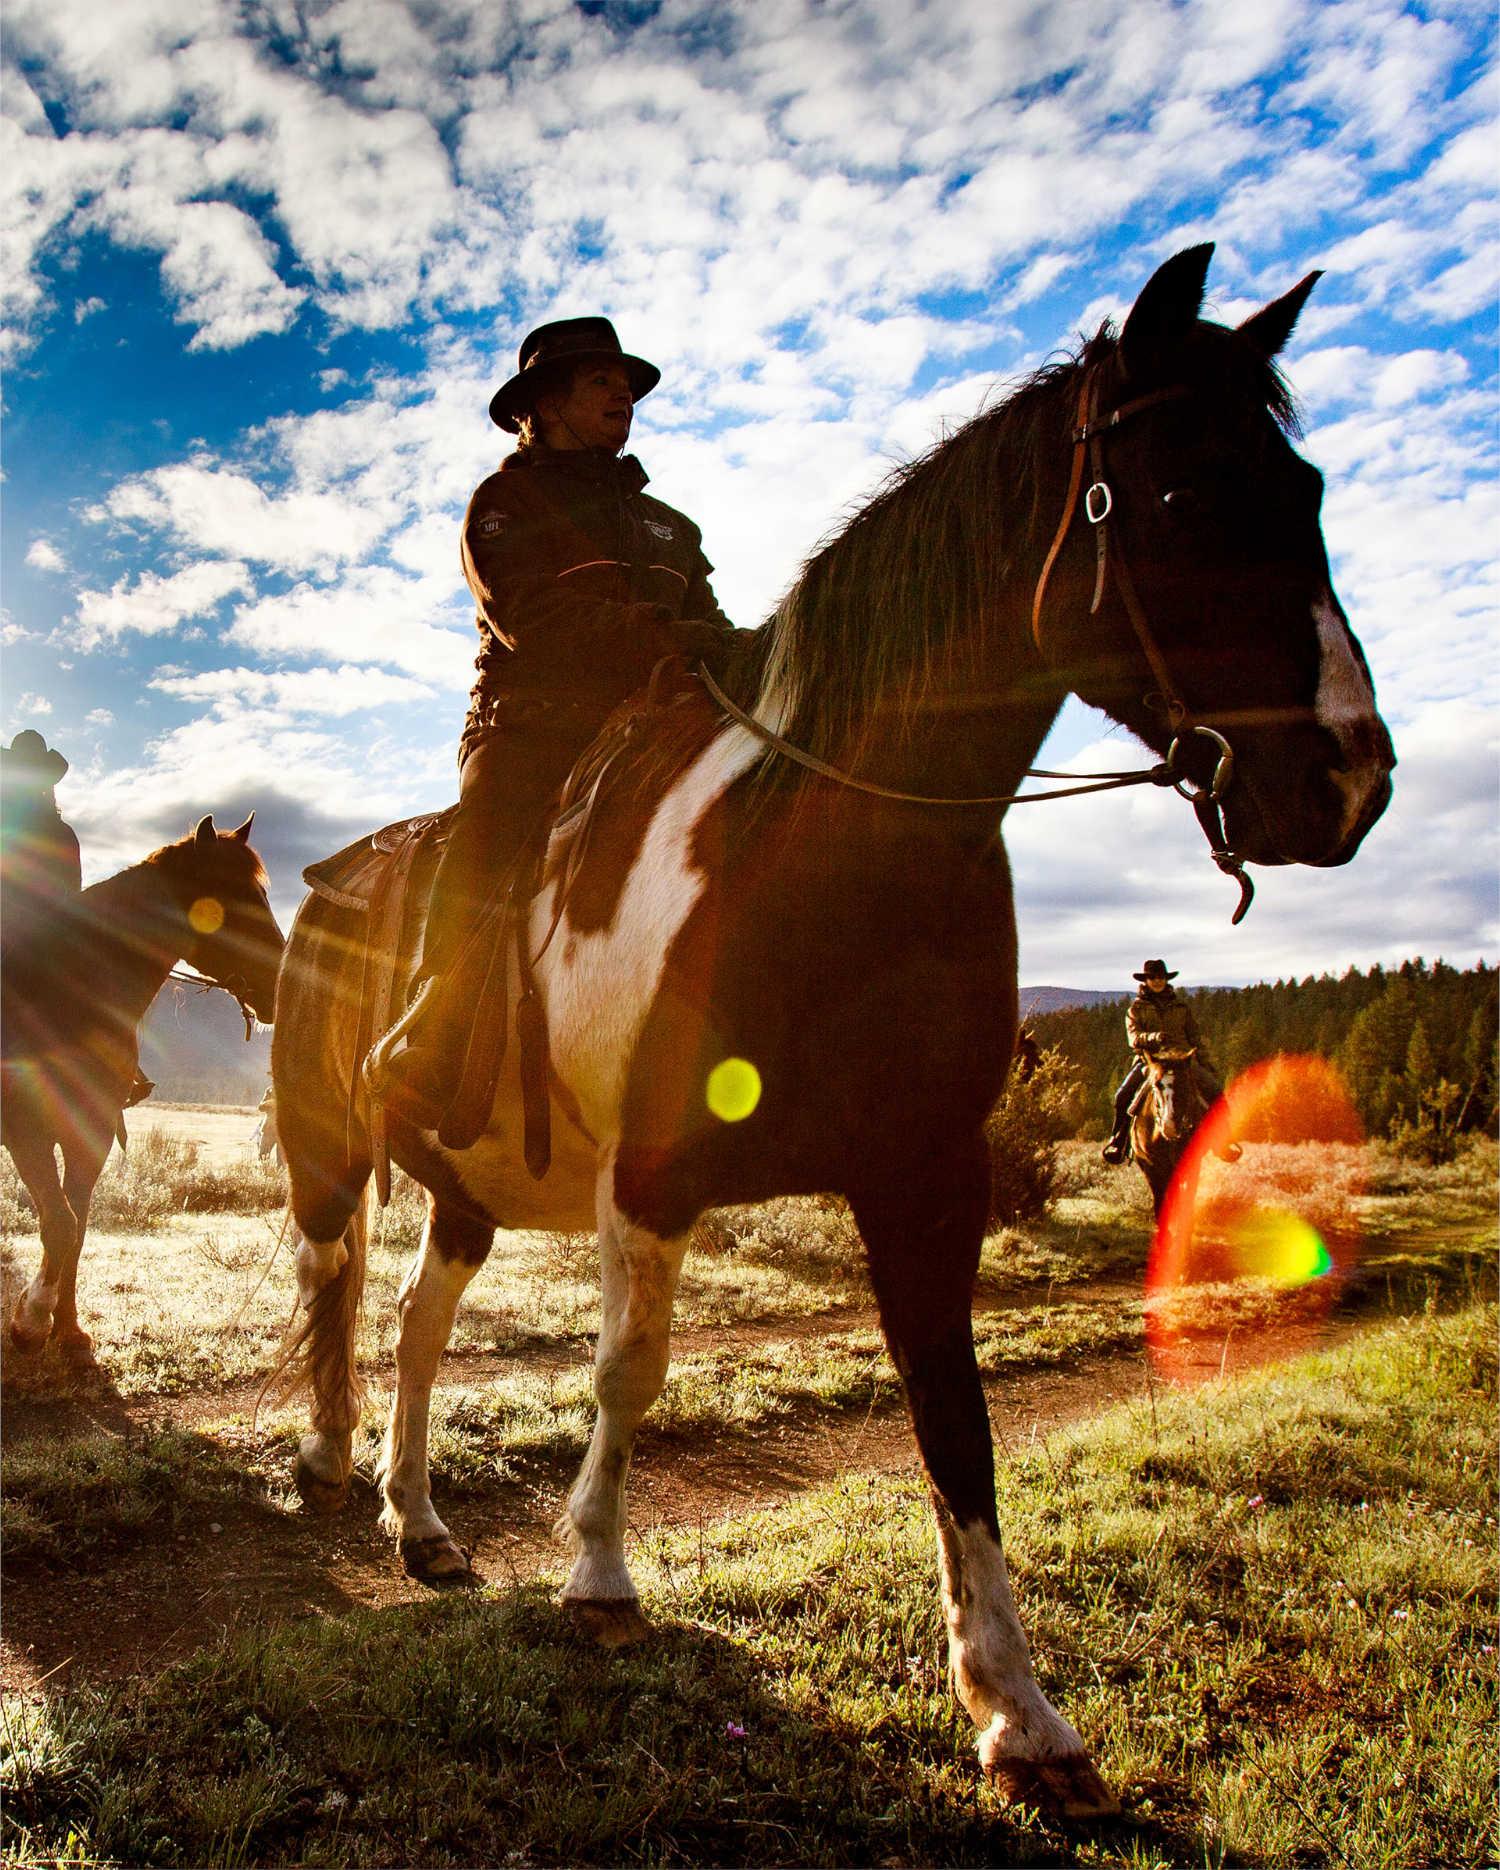 Horse rider in Montana, USA